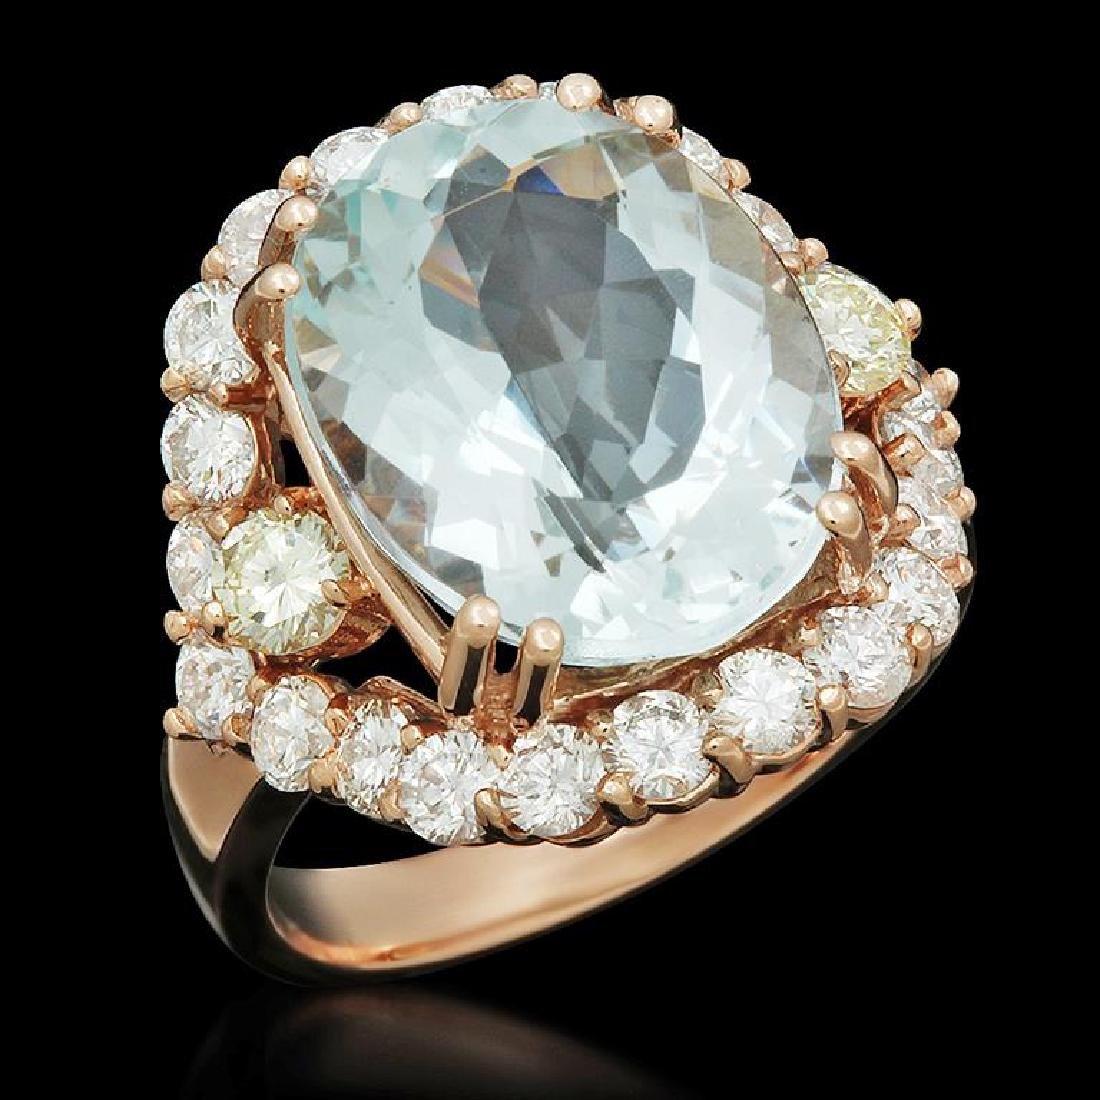 14K Gold 8.00ct Aquamarine 2.05ct Diamond Ring